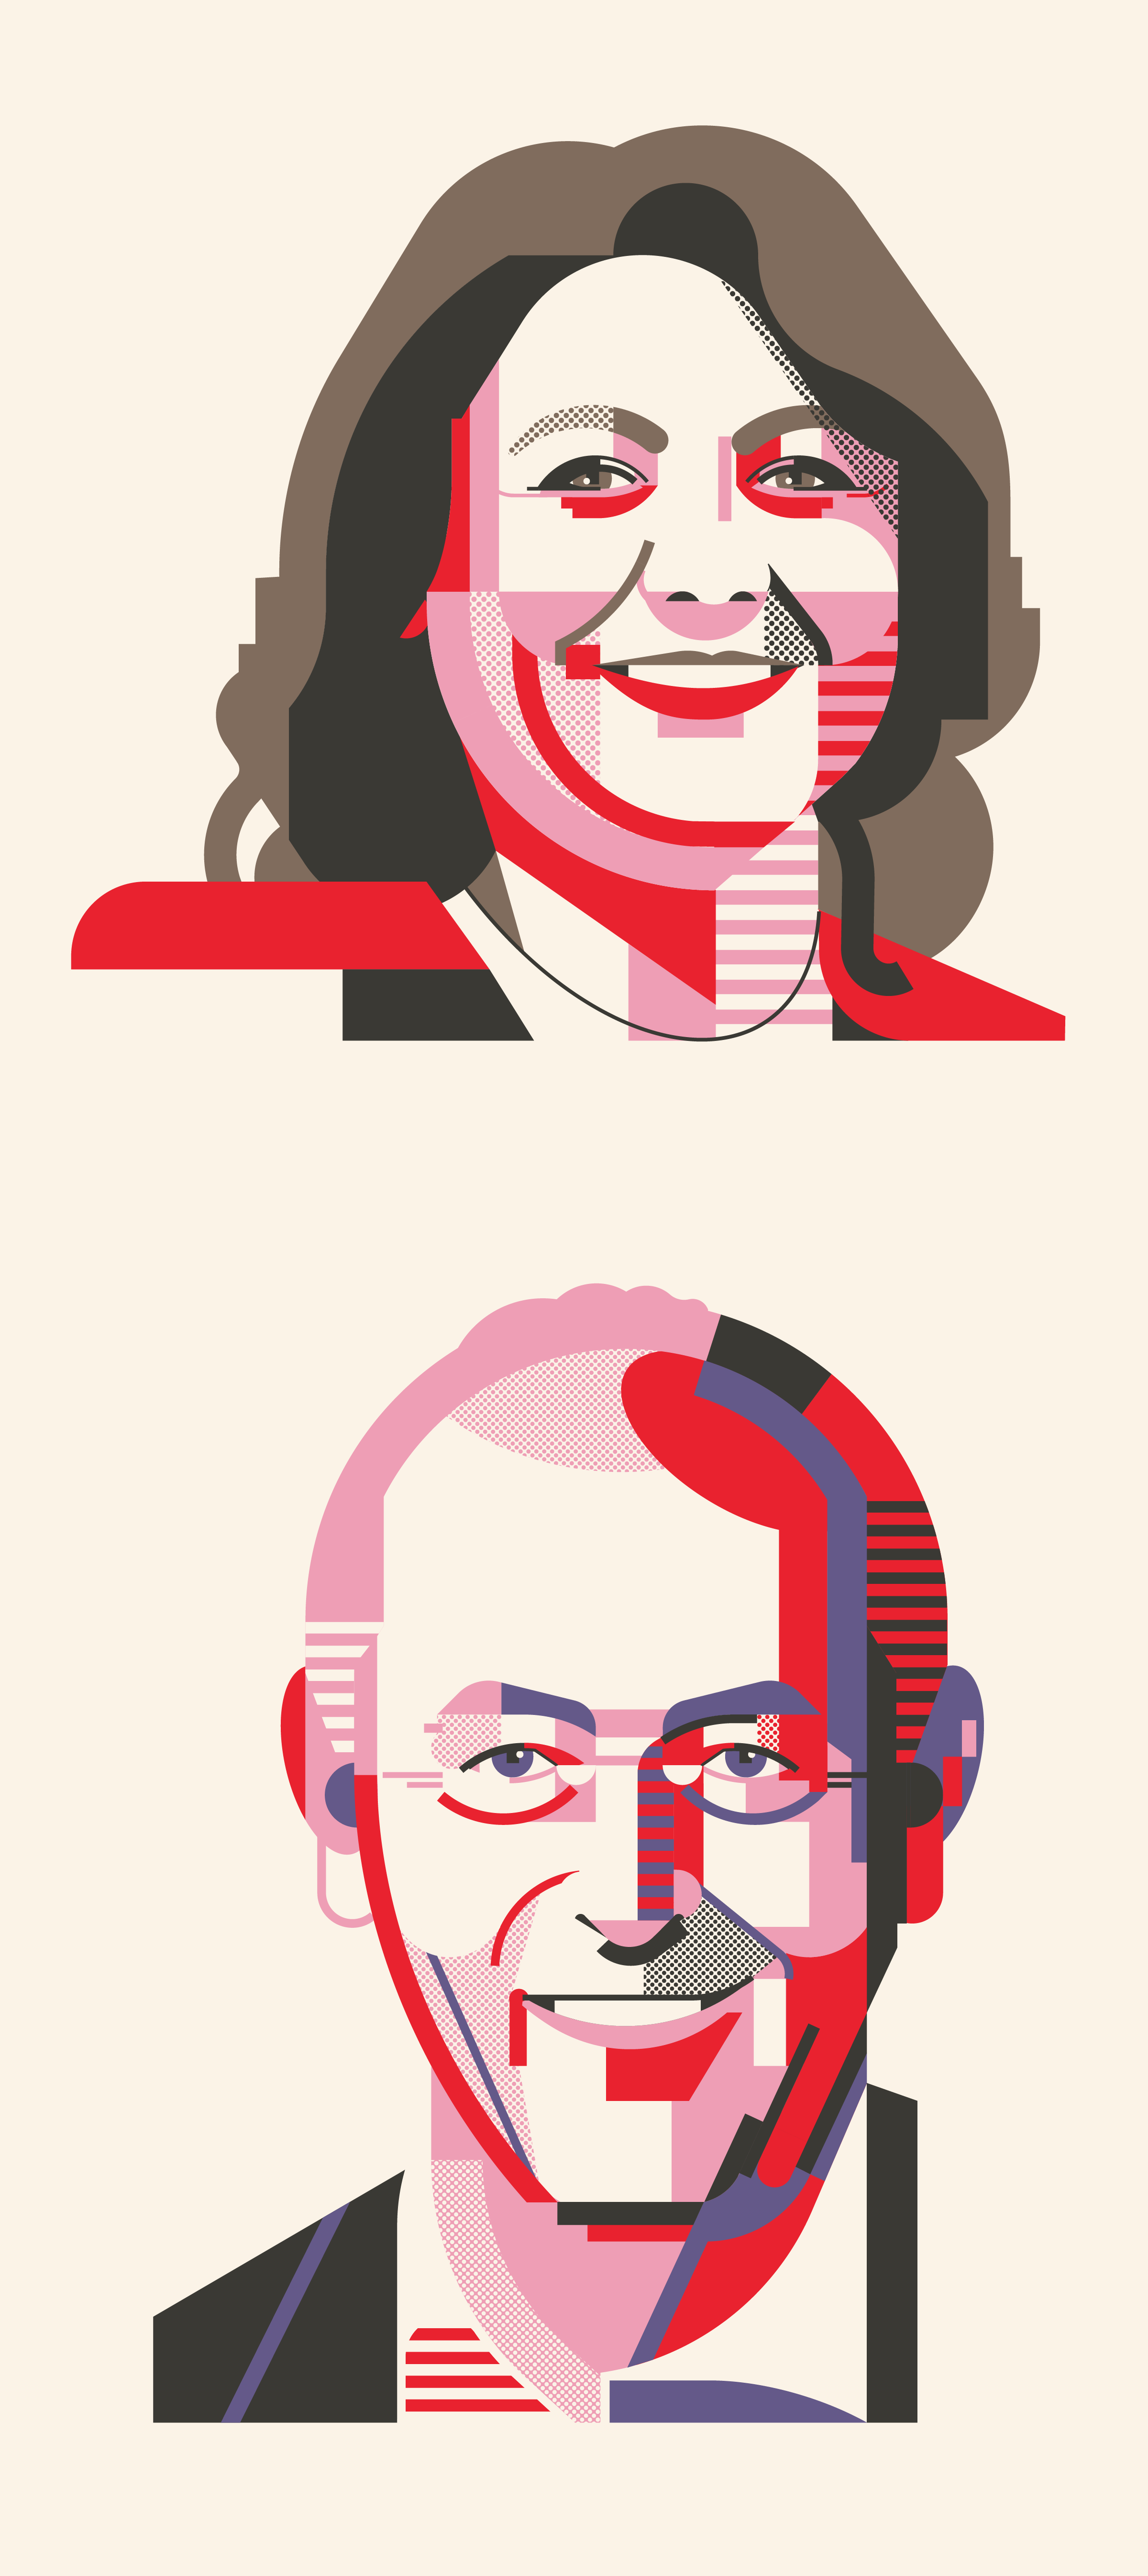 aleksandar-savic_fujitsu-icio-portraits